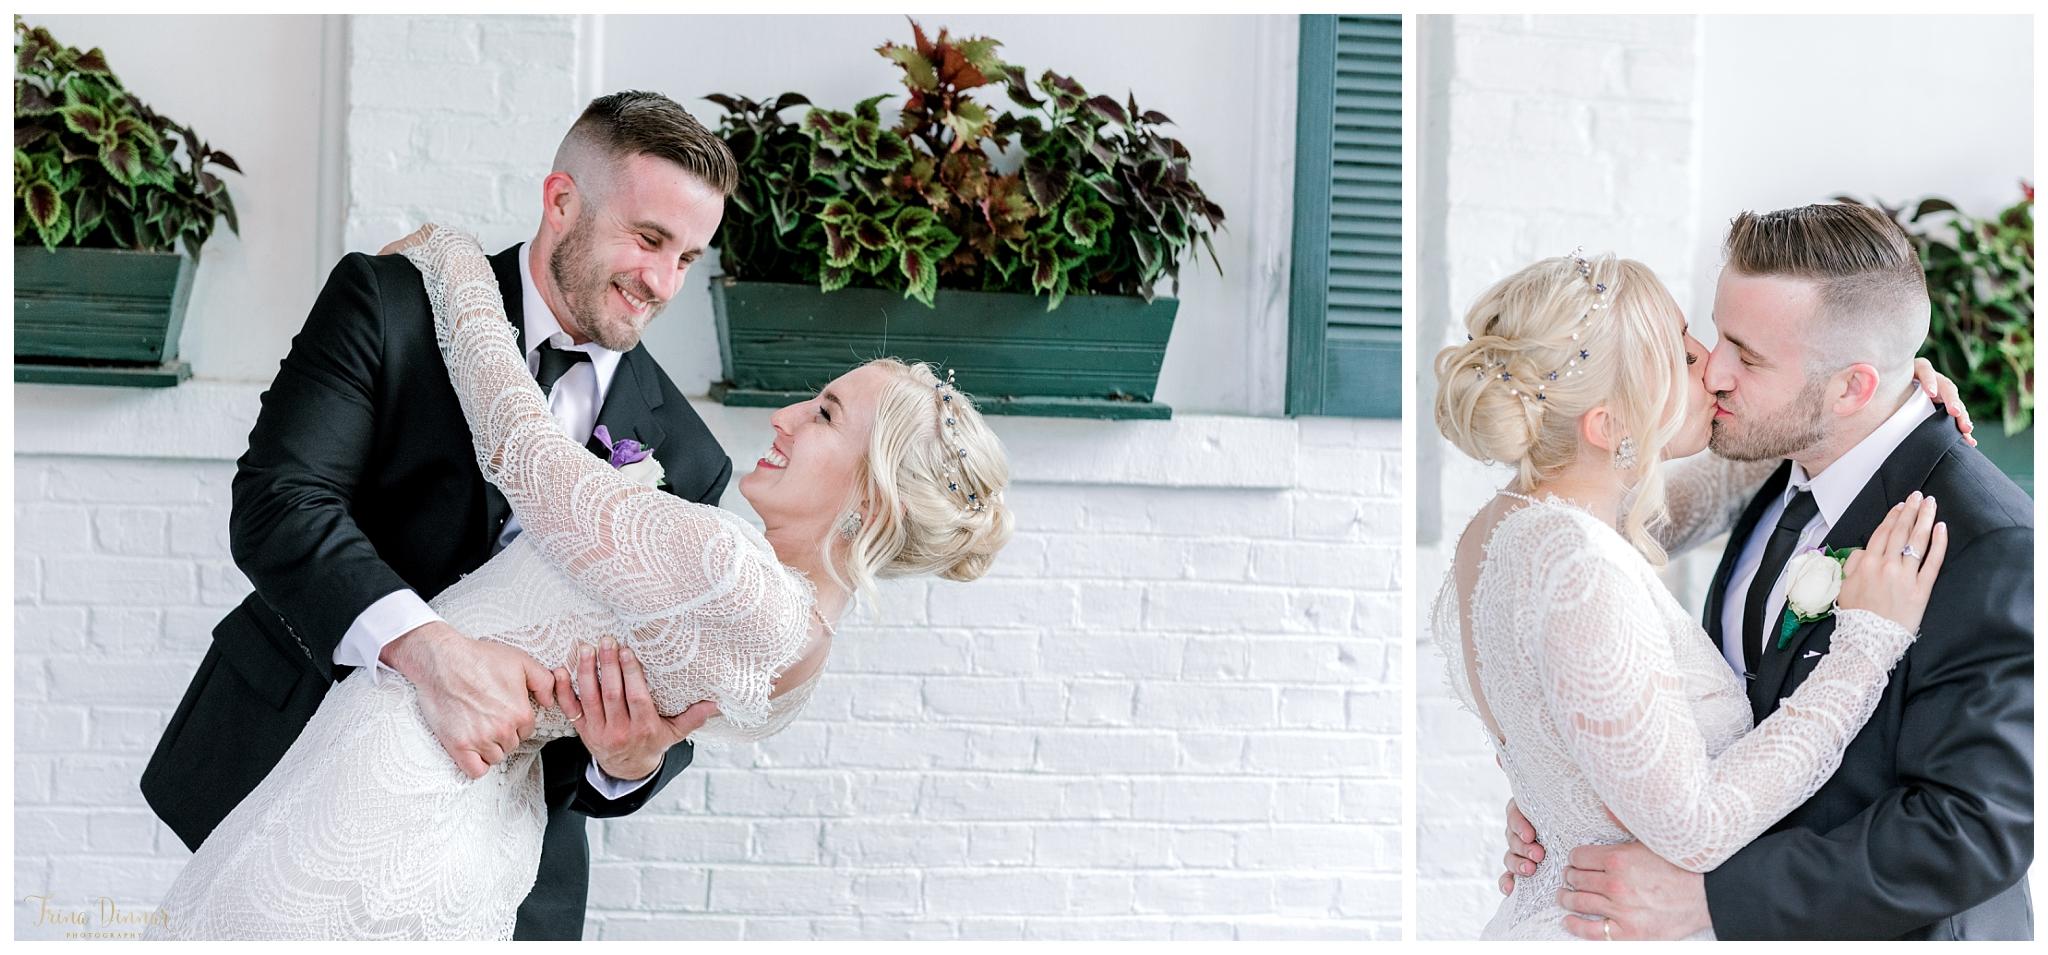 Breanna and Matt's Wedding